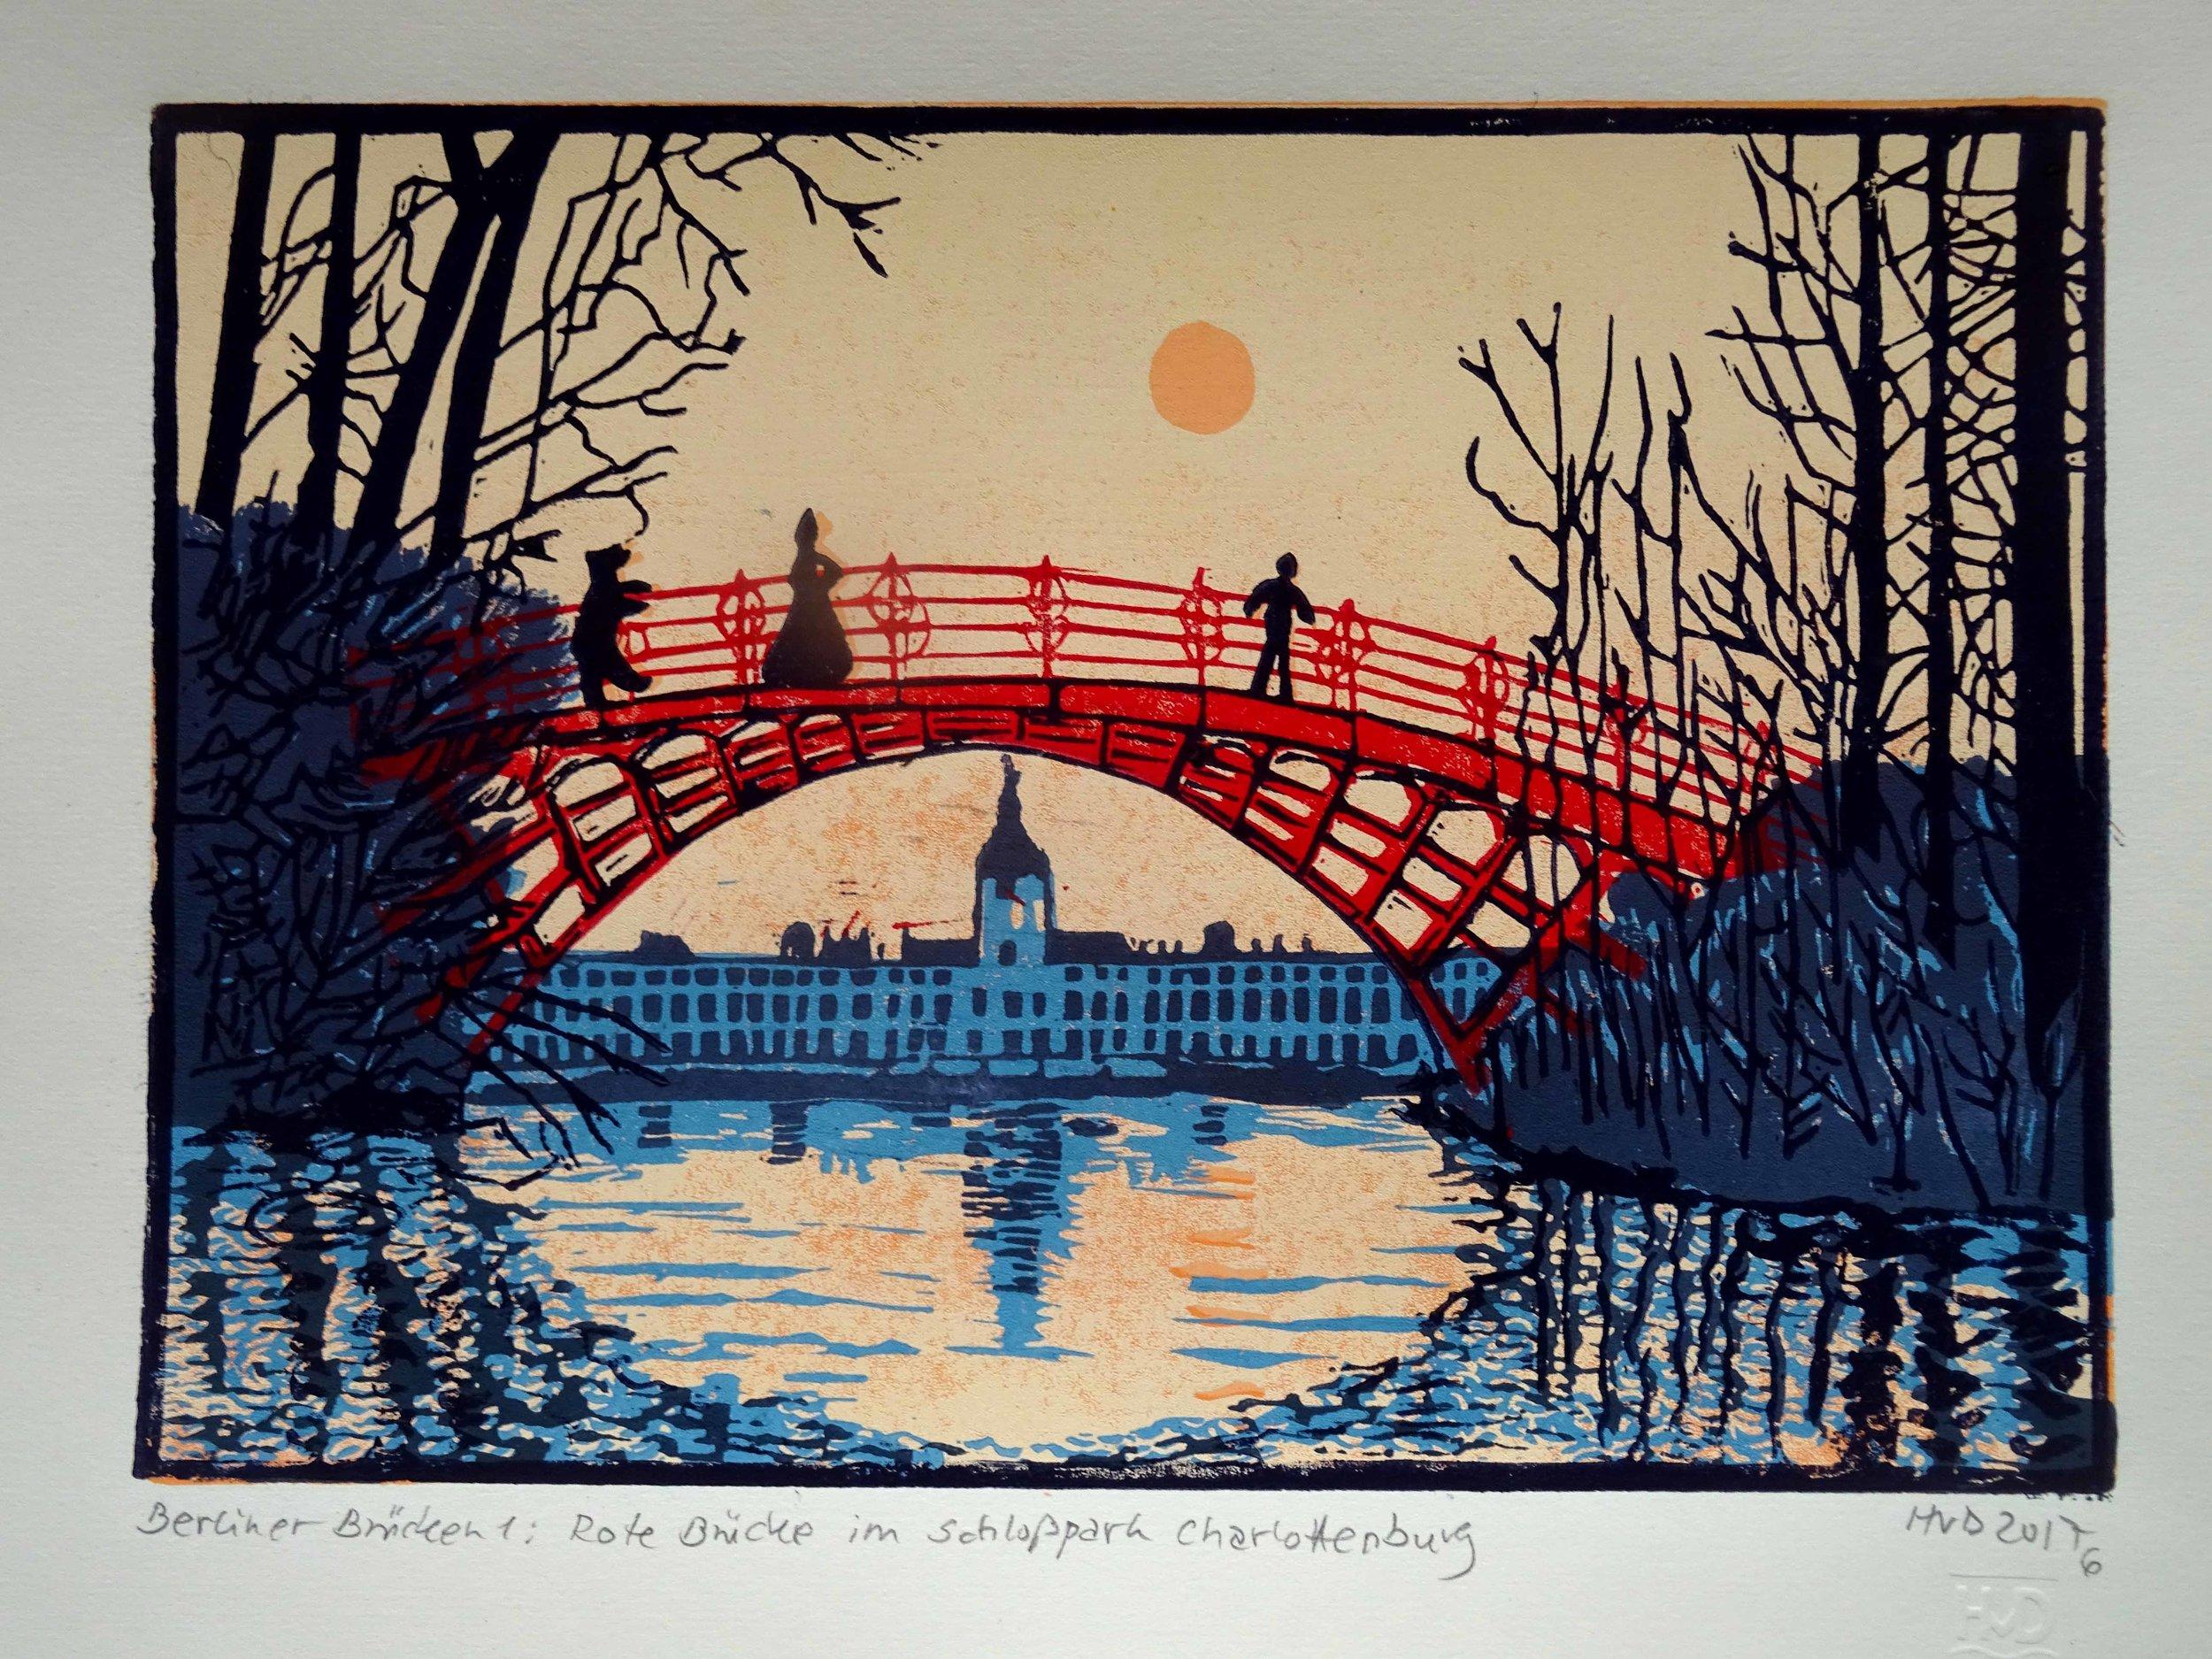 240 - Rote Brücke Schloß Charloettenburg Berlin, 4-plate lino 21x30 cm, 100 €